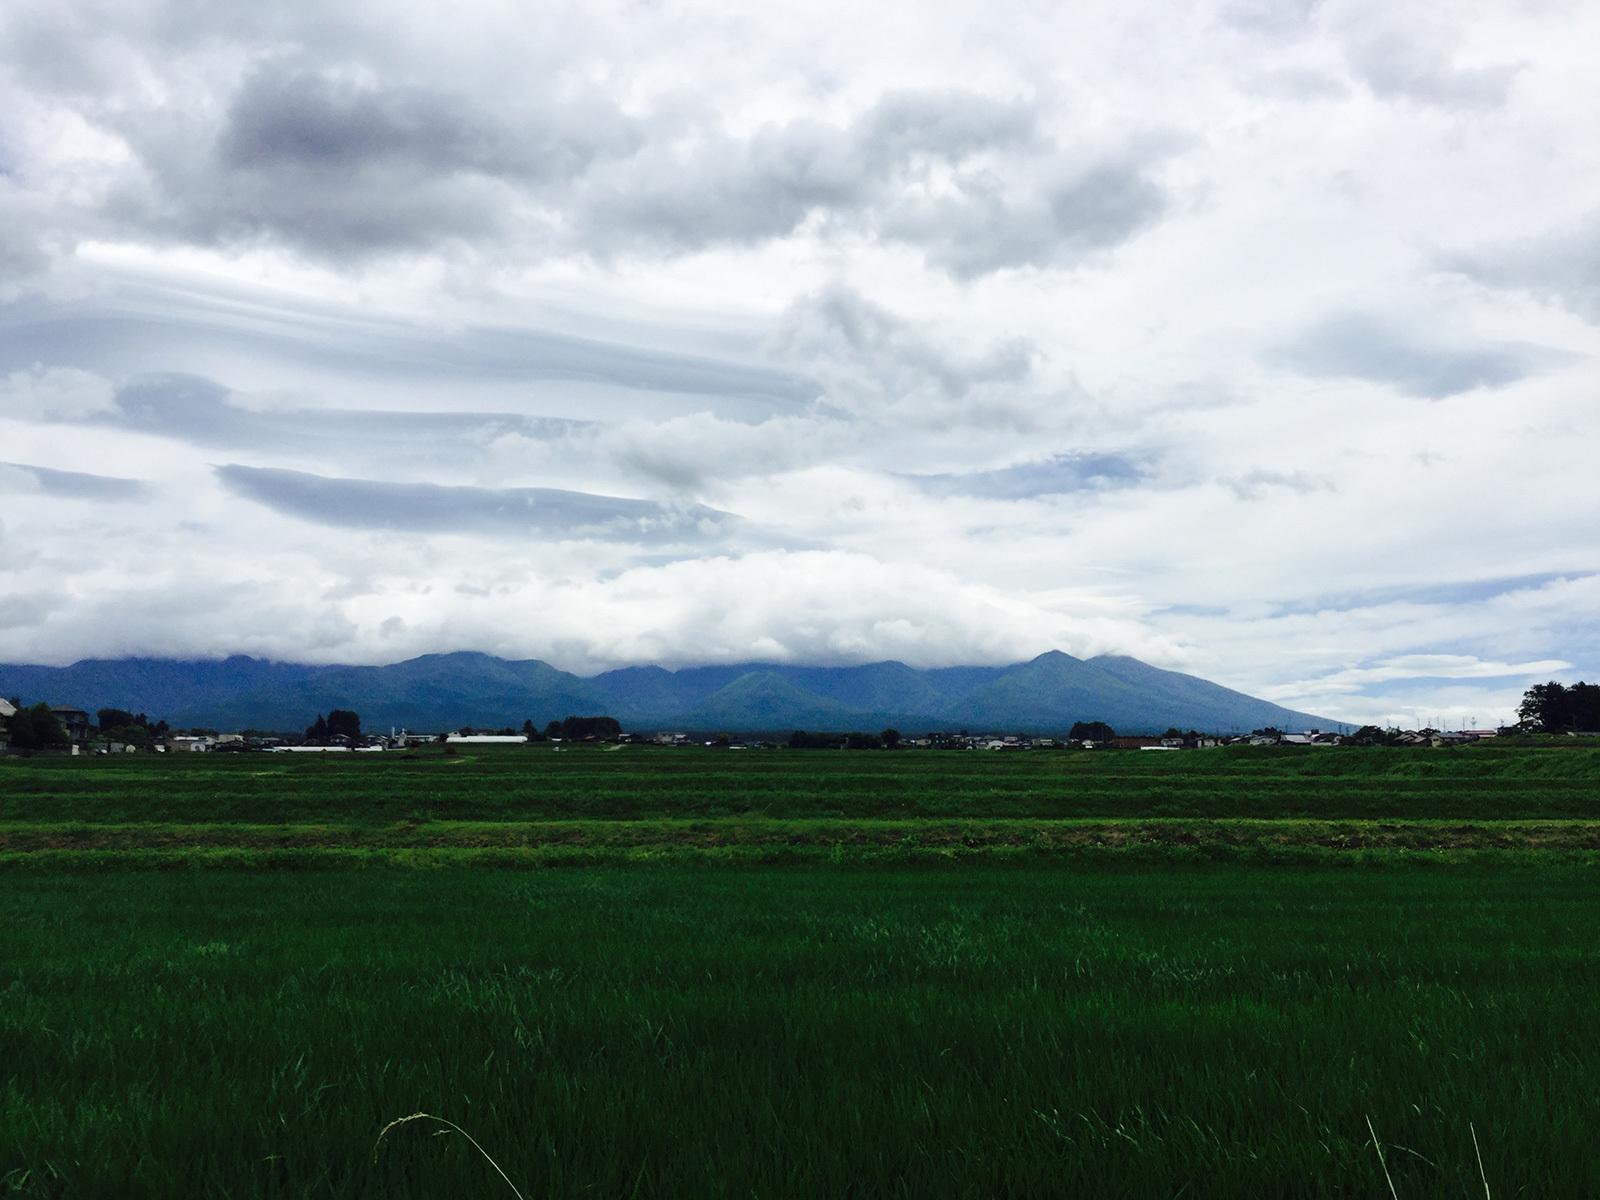 20170703_yatsugatake_2s.jpg